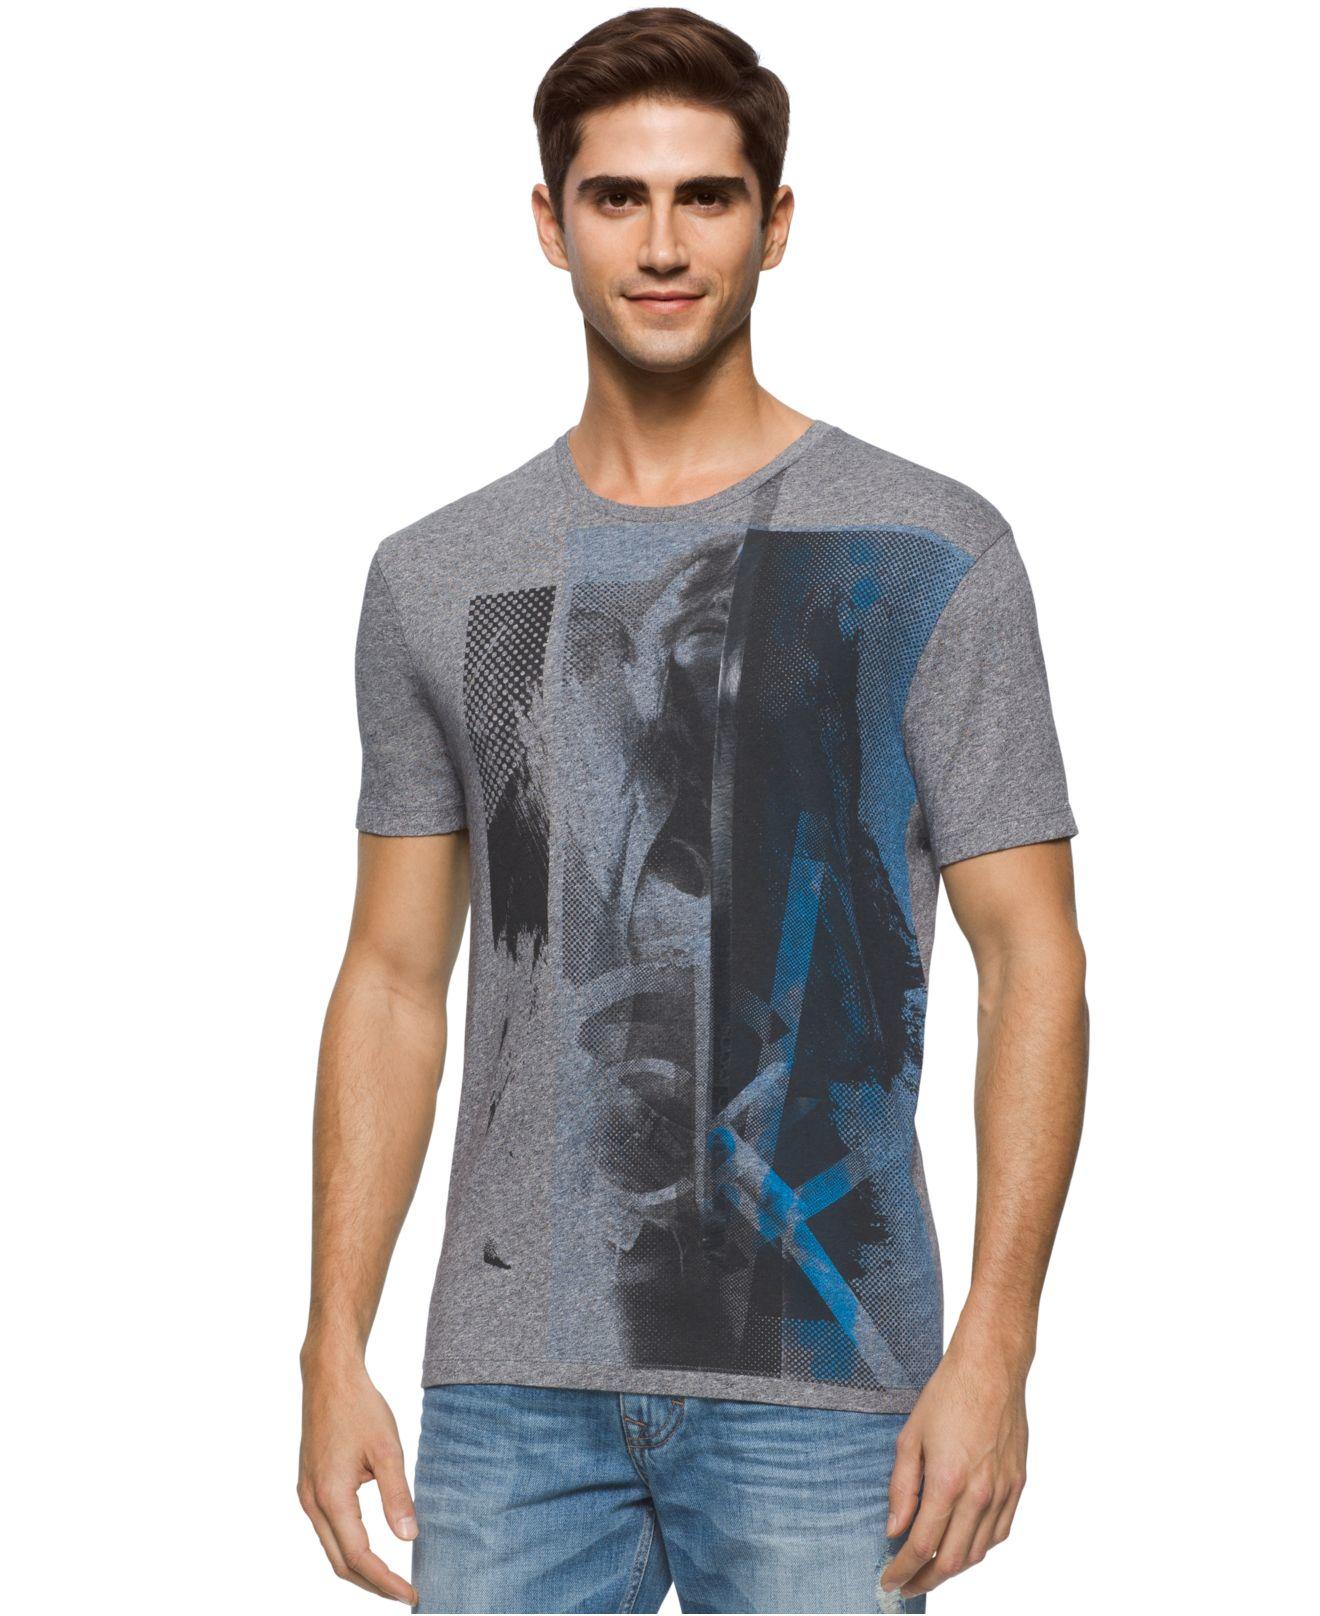 calvin klein jeans men 39 s silhouette graphic print t shirt. Black Bedroom Furniture Sets. Home Design Ideas